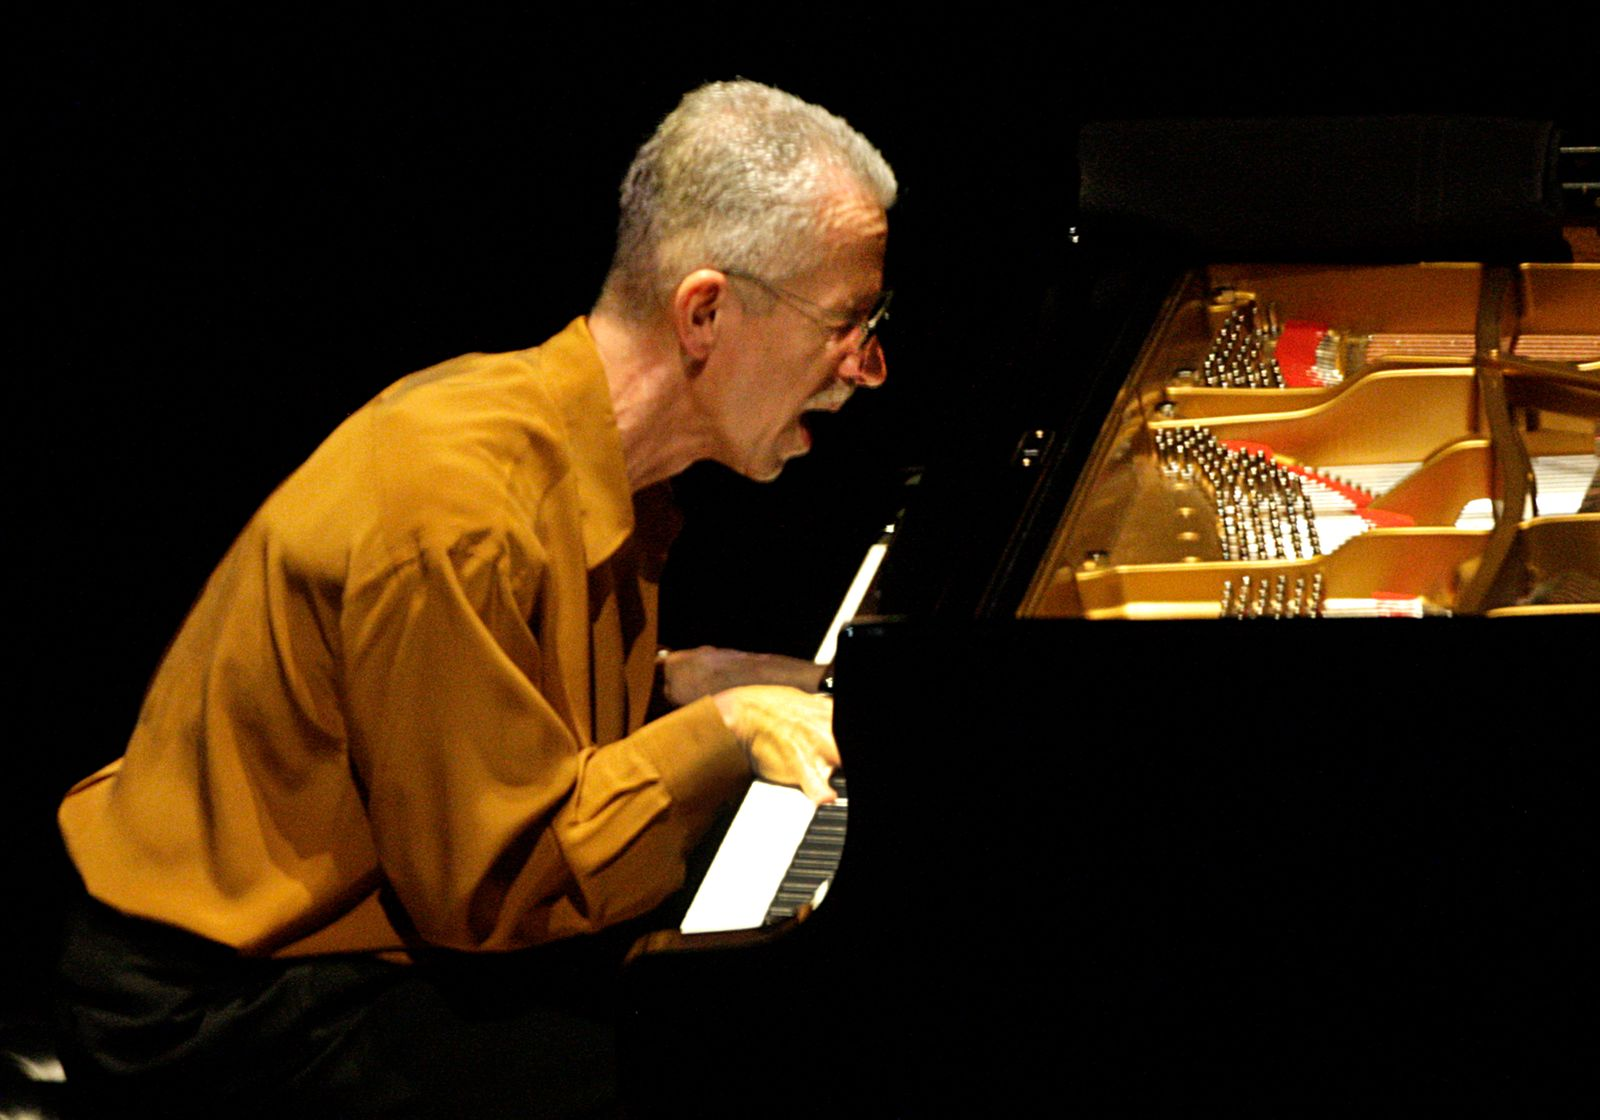 Keith Jarrett's solo performance at Walt Disney Concert Hall on Mar. 27, 2012.